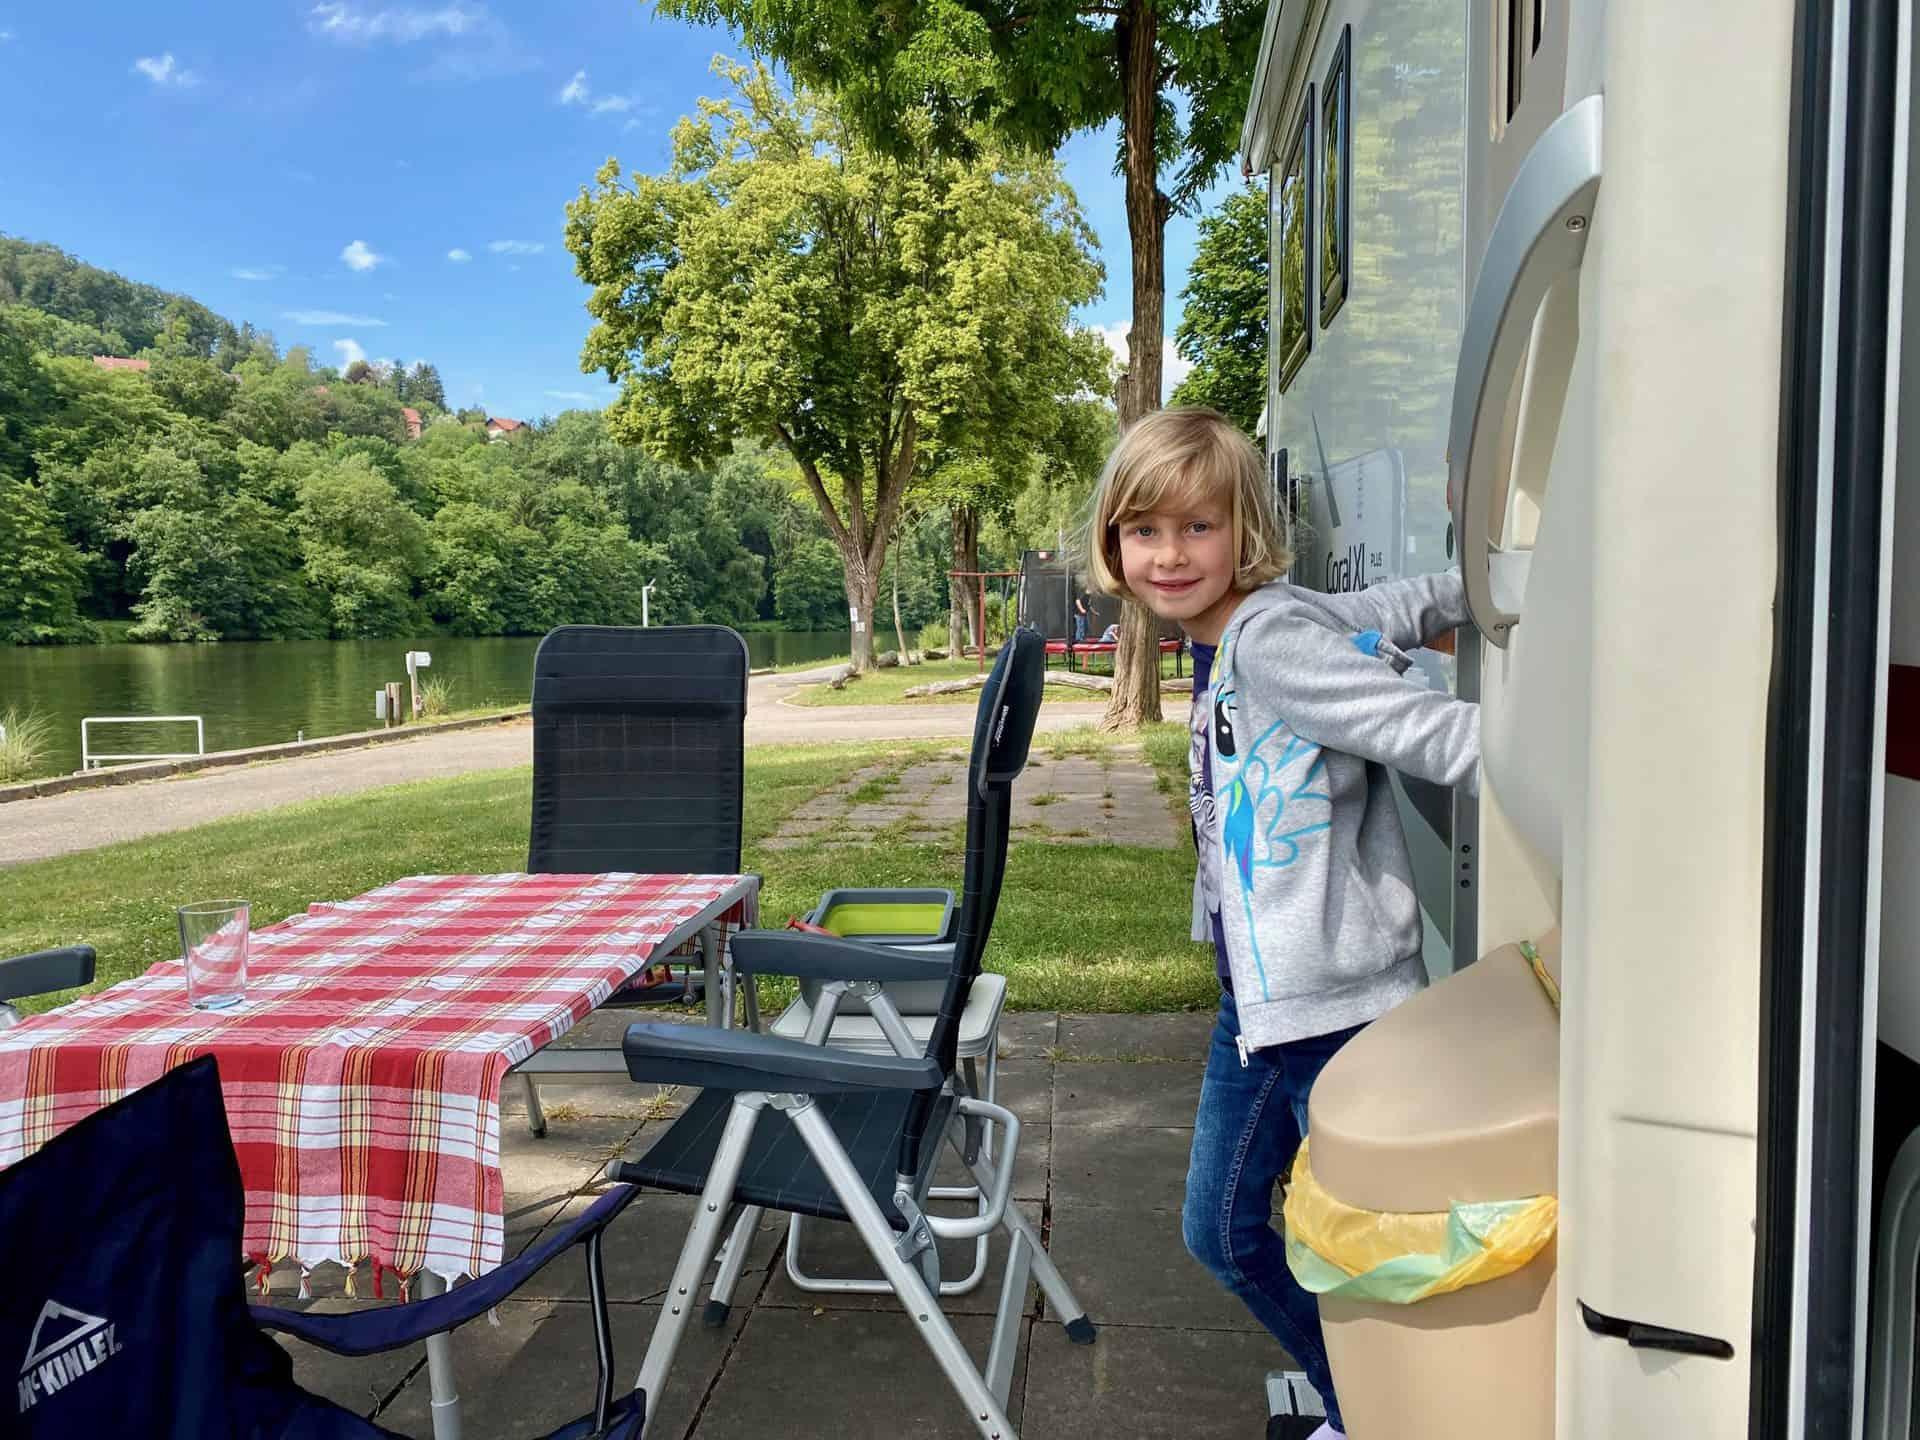 Campingplatz-Fortuna-Wohnmobil-Tochter